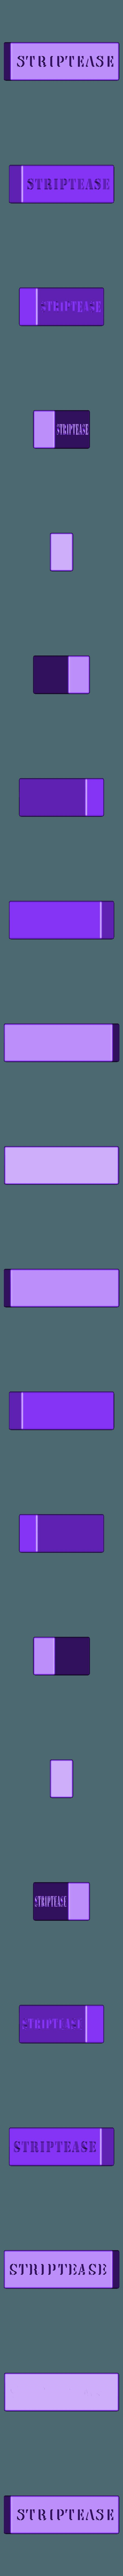 Jenga block - Striptease.stl Download STL file Jenga Rules • 3D print model, Made_In_Space